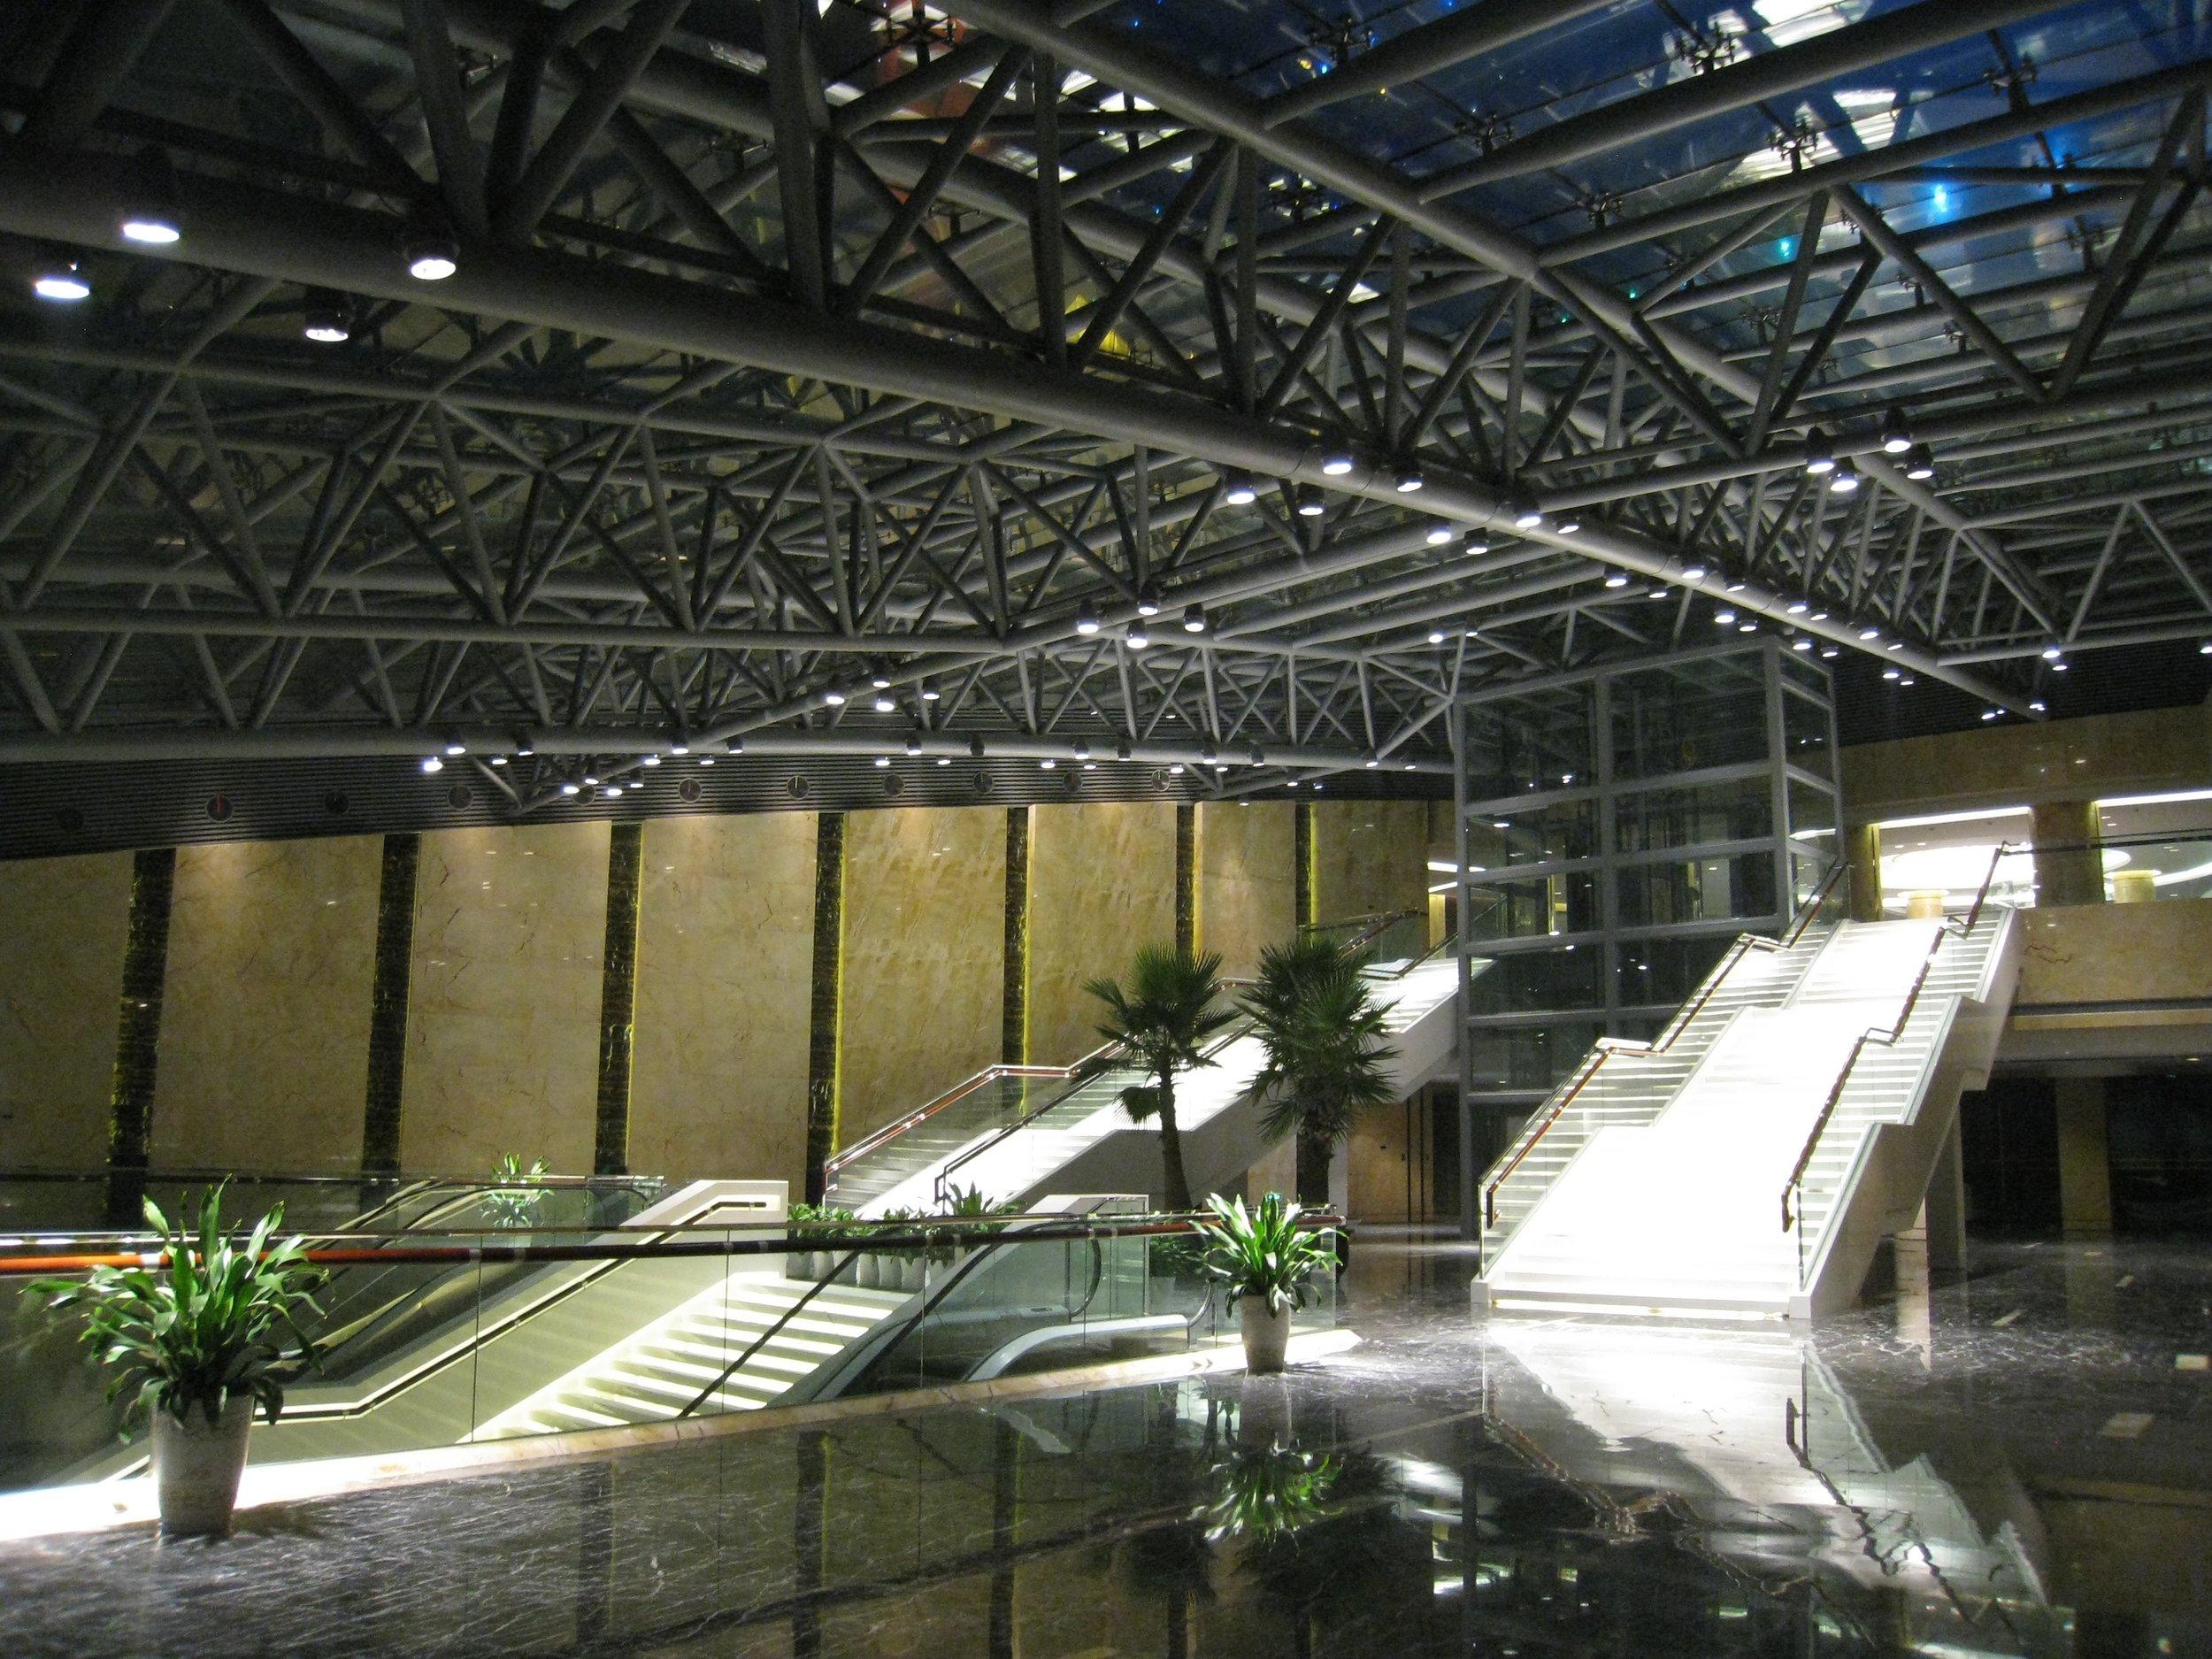 CONVENTION CENTRE @ INTERCONTINENTAL, HANGZHOU